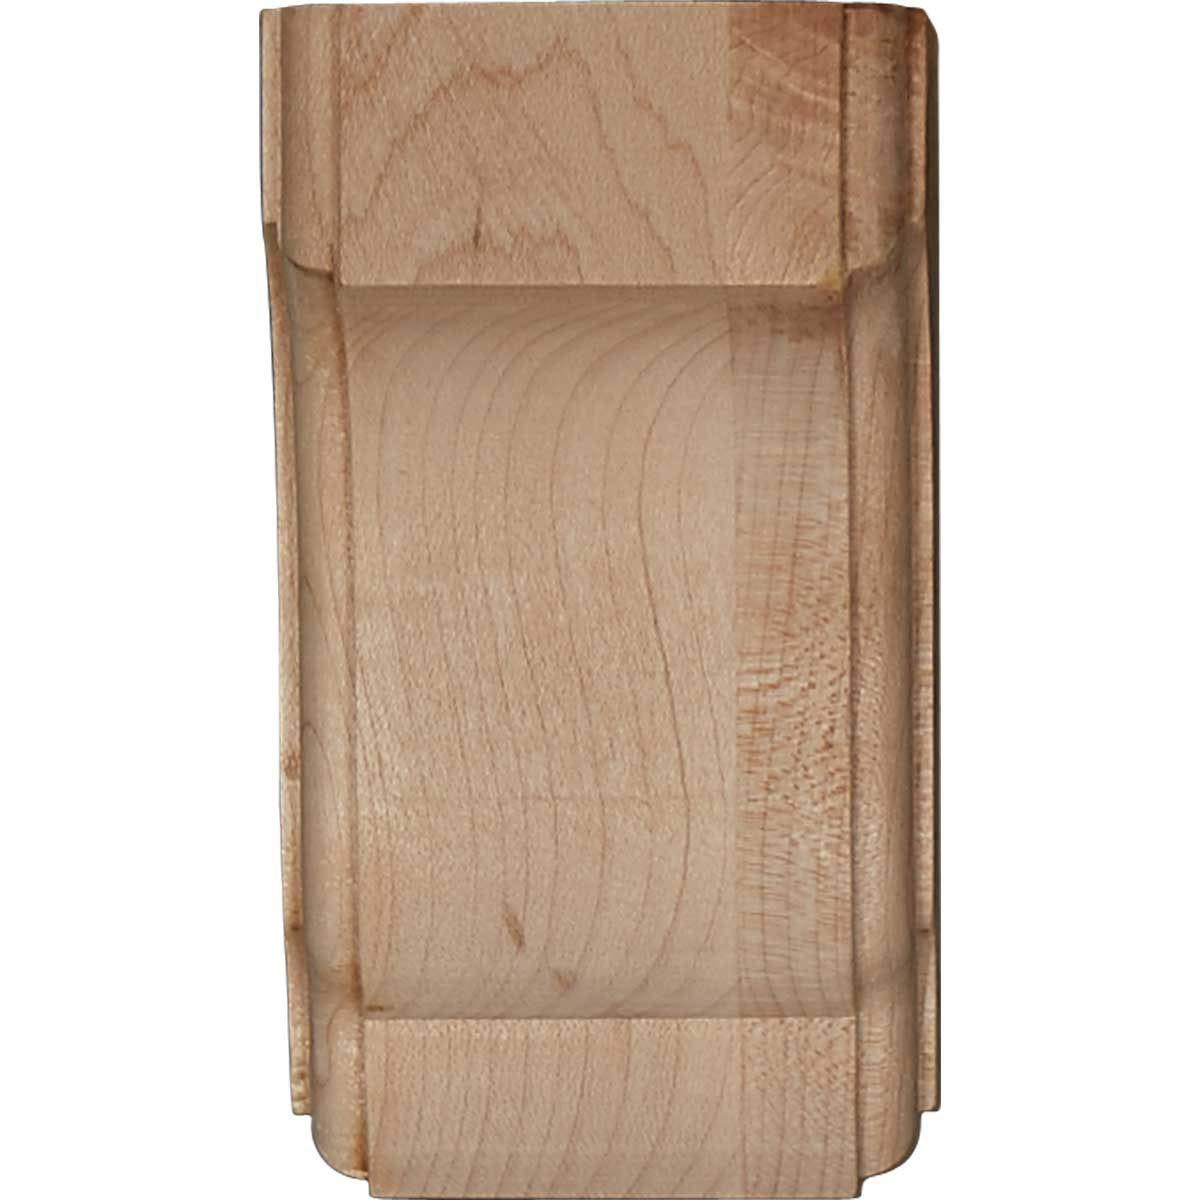 6-Pack Ekena Millwork COR02X02X04CPMA-CASE-6 2 1//2 inch W x 2 3//4 inch D x 4 1//2 inch H Capistrano Mission Corbel , Maple